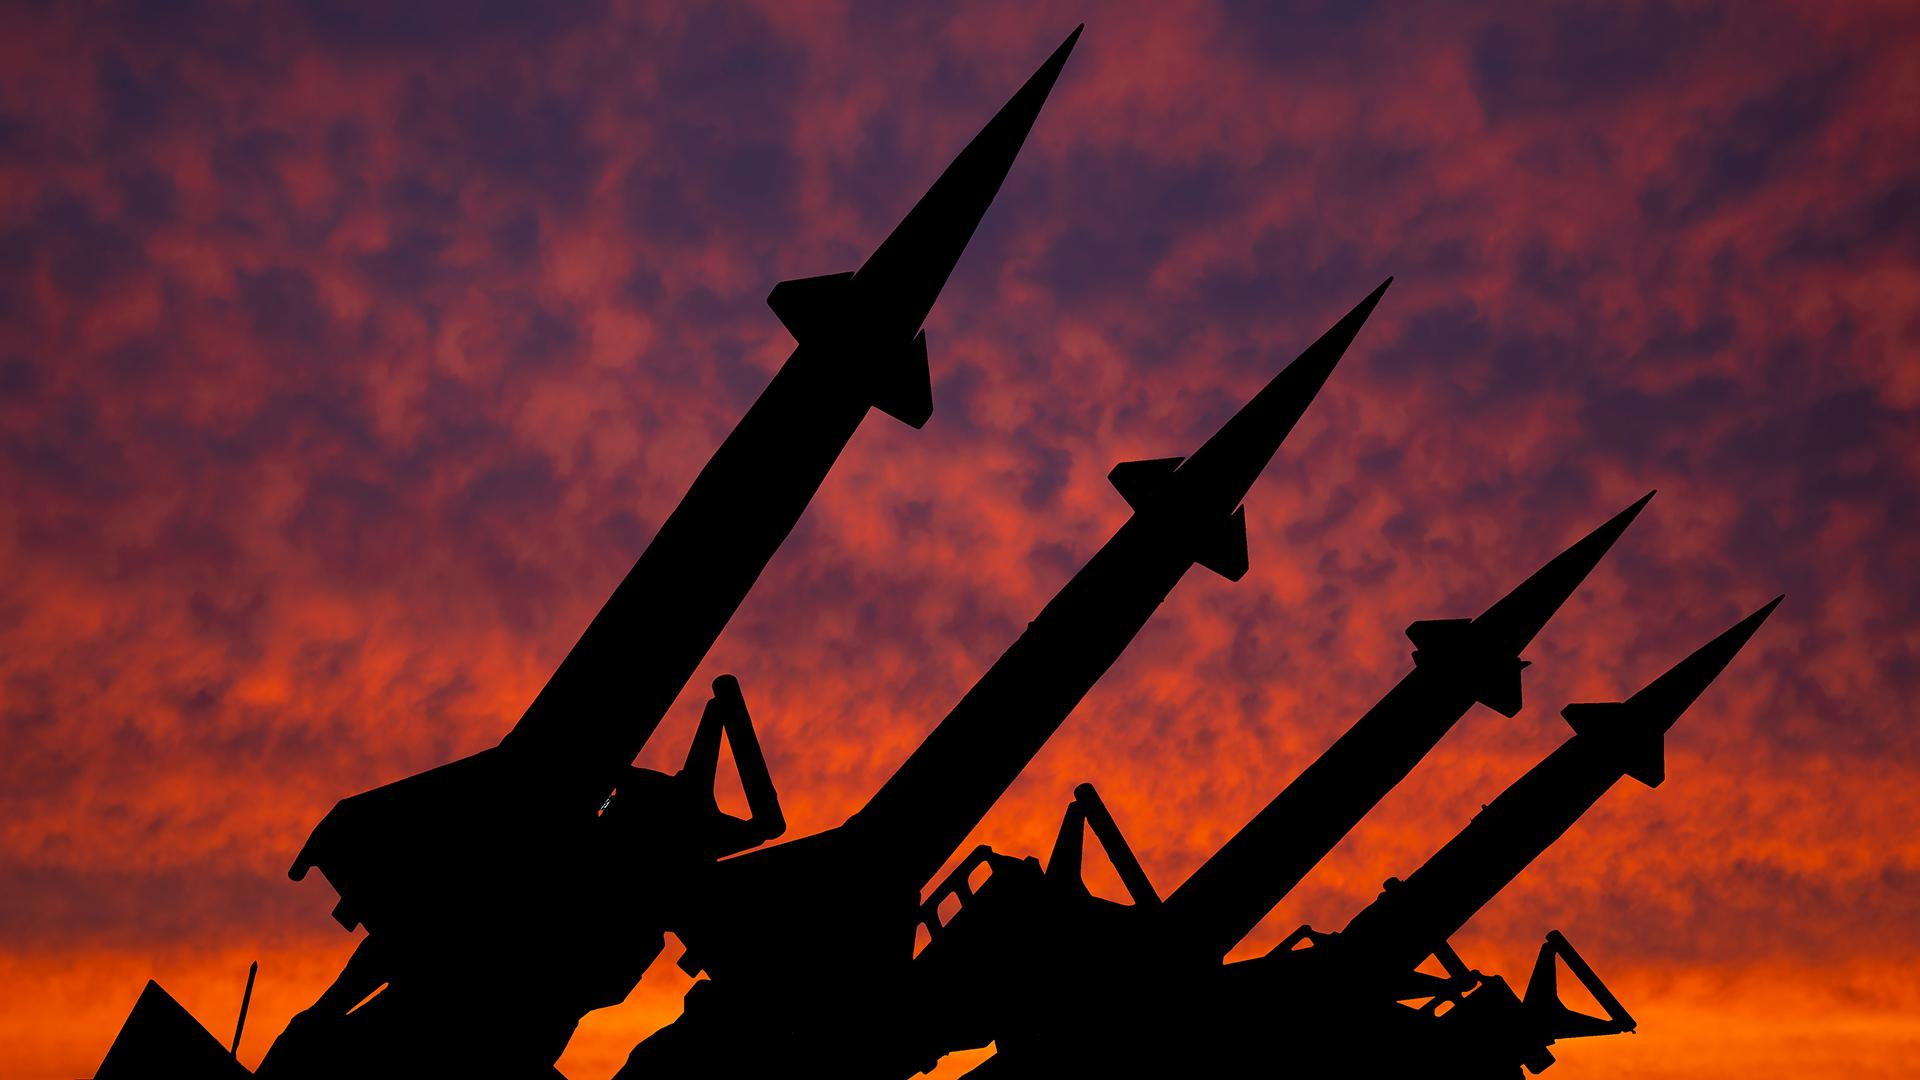 Гонка вооружений — википедия. что такое гонка вооружений